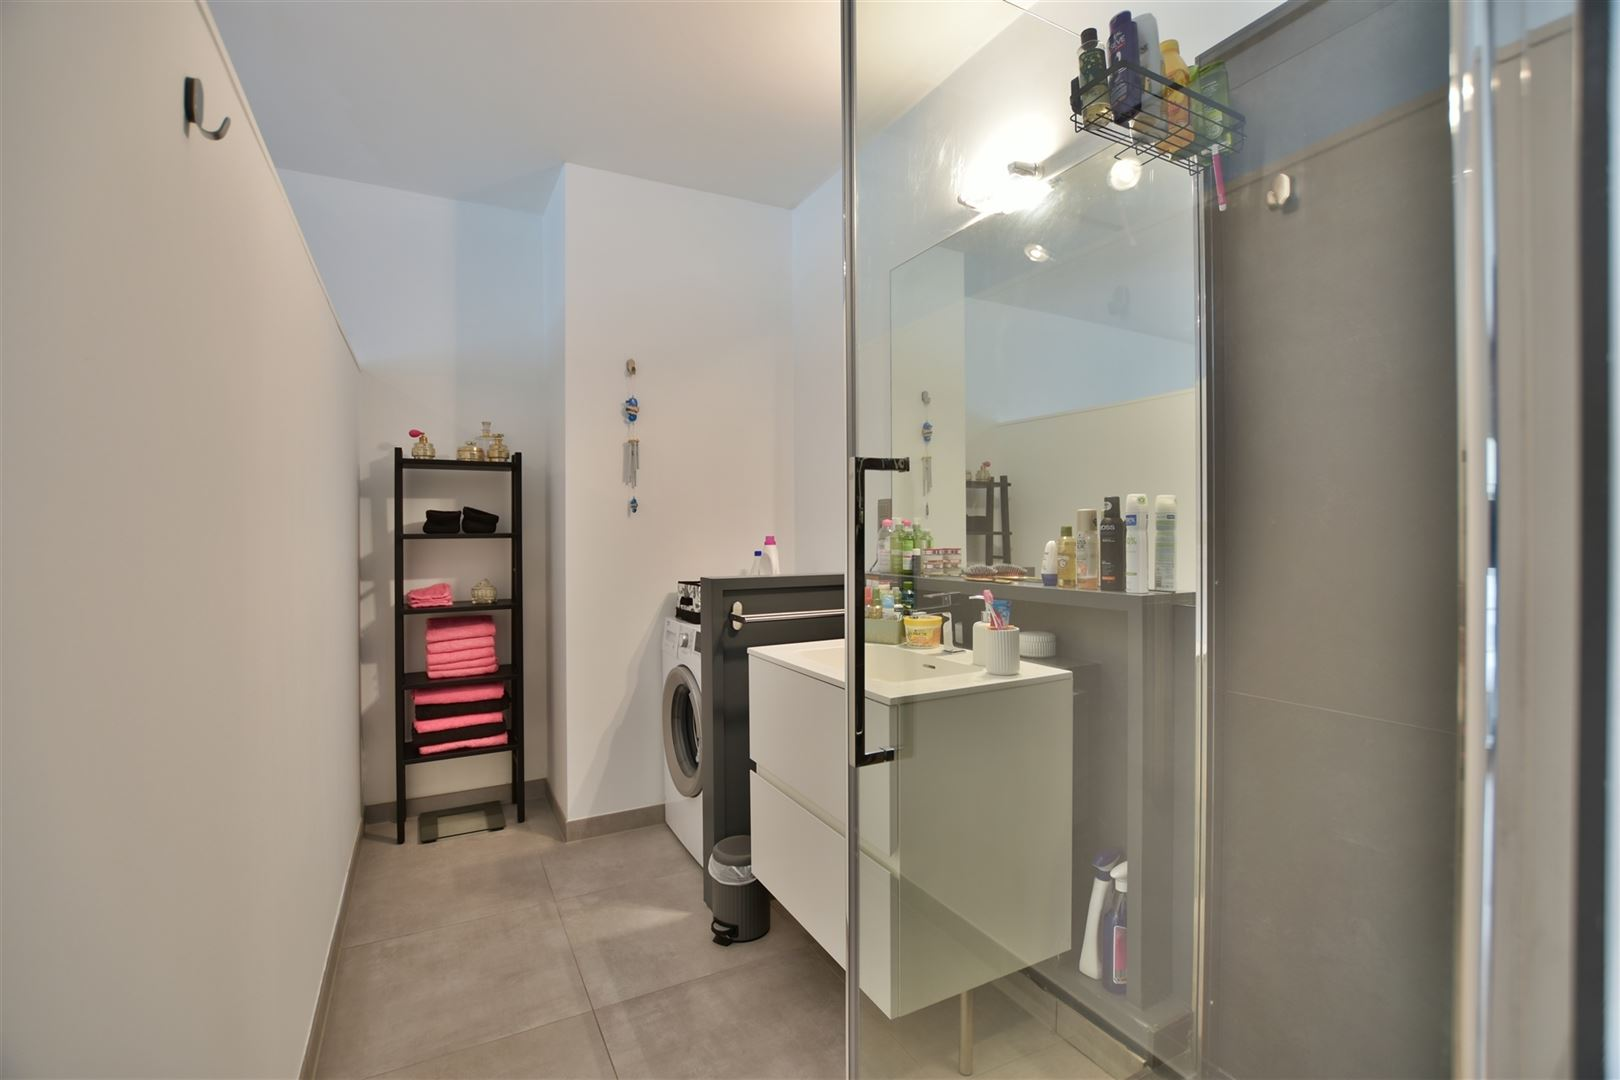 Foto 9 : Appartement te 9200 DENDERMONDE (België) - Prijs € 199.000